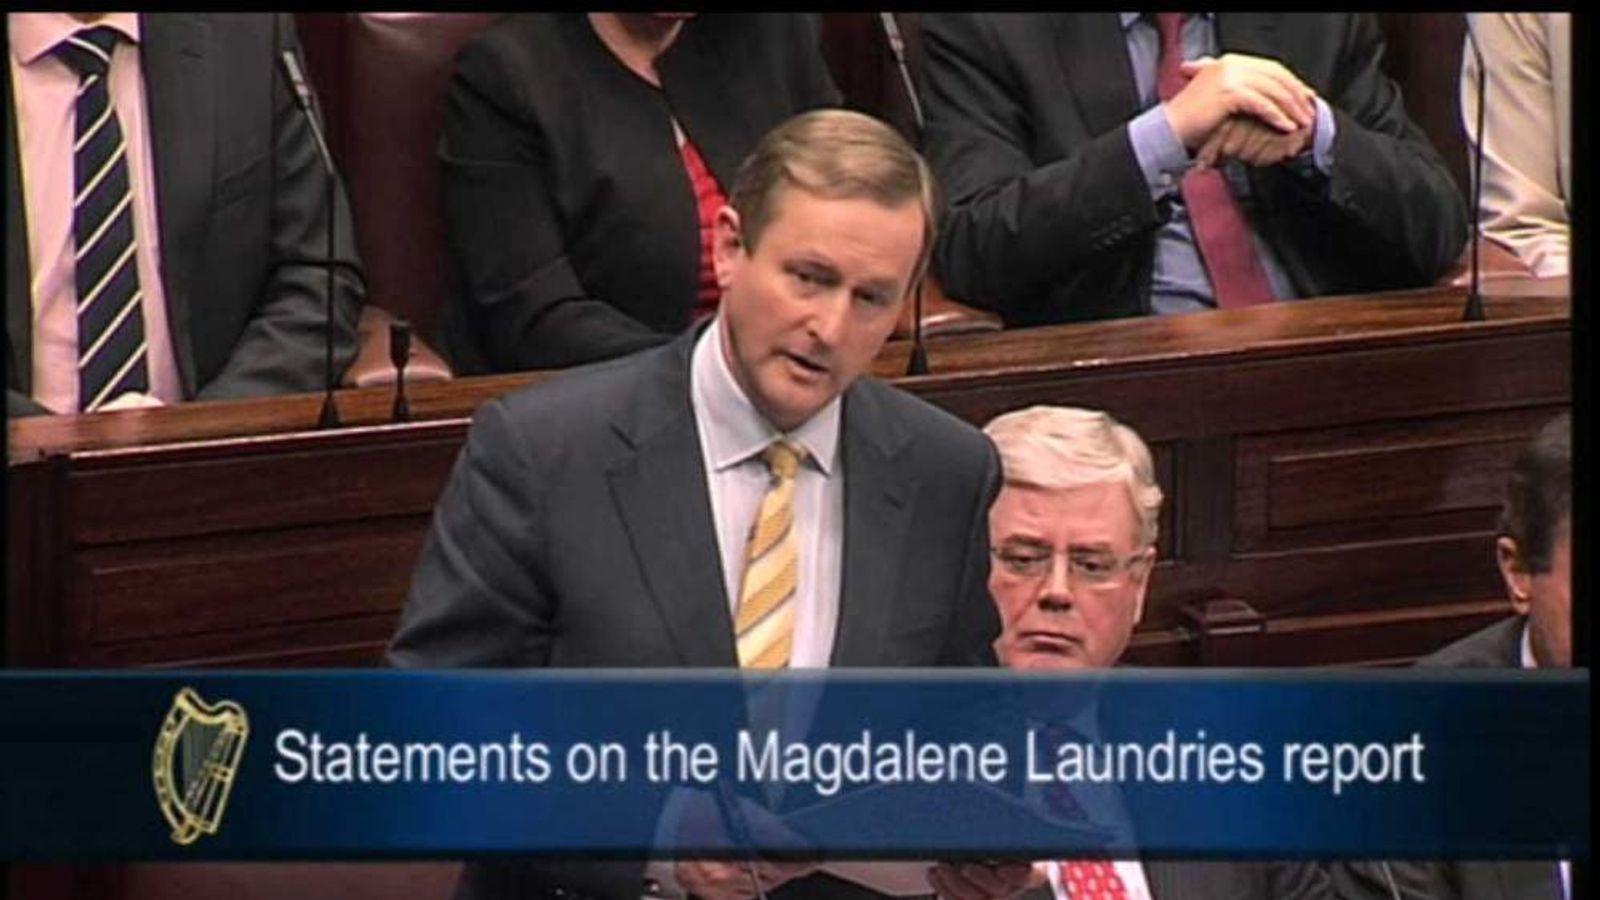 Irish prime minister Enda Kenny makes statement on the Magdalene Laundries